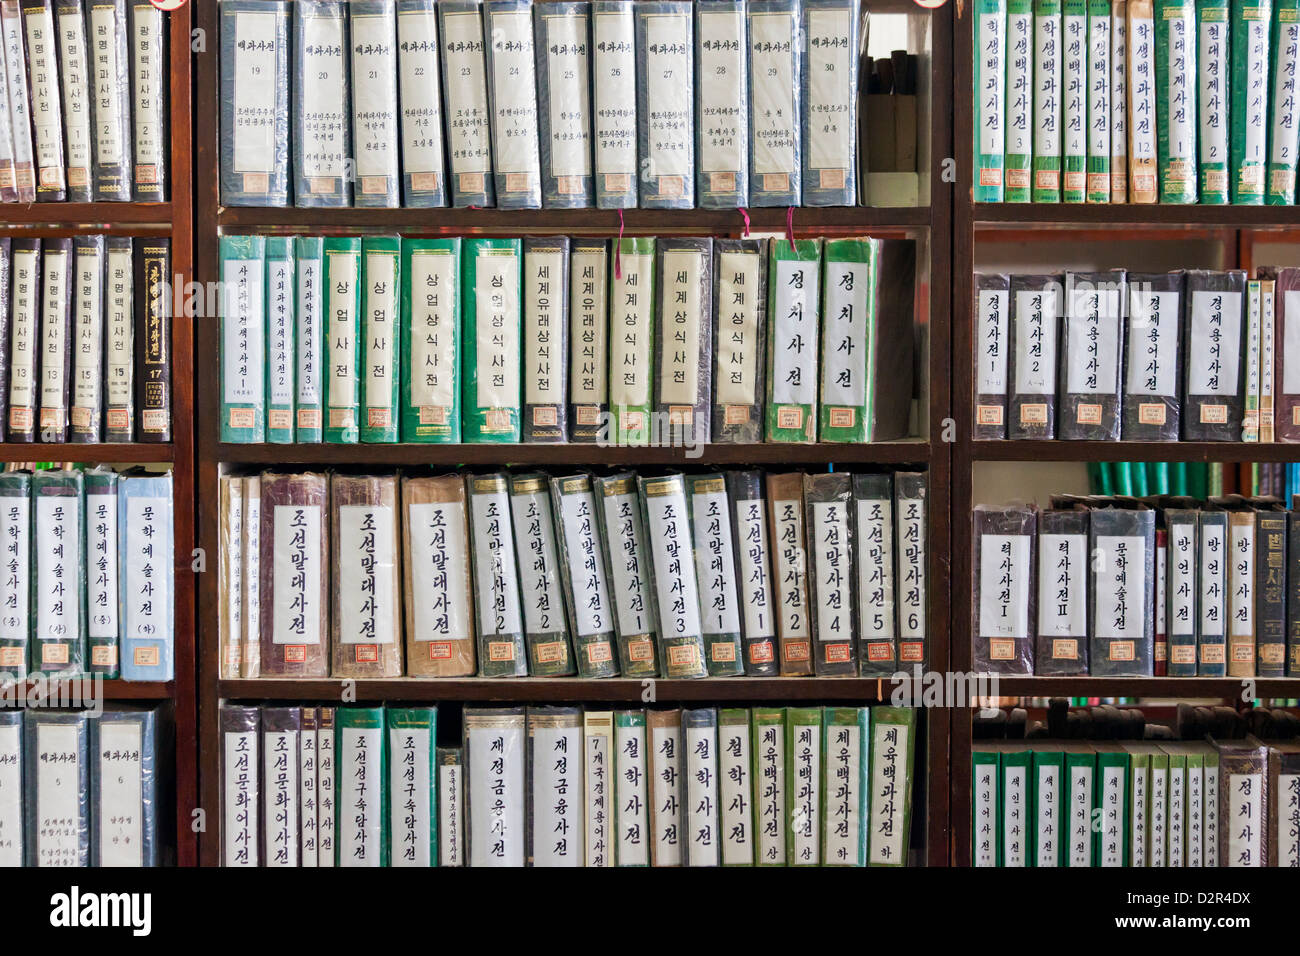 Book shelf, Grand People's Study House, Pyongyang, Democratic People's Republic of Korea (DPRK), North Korea, - Stock Image